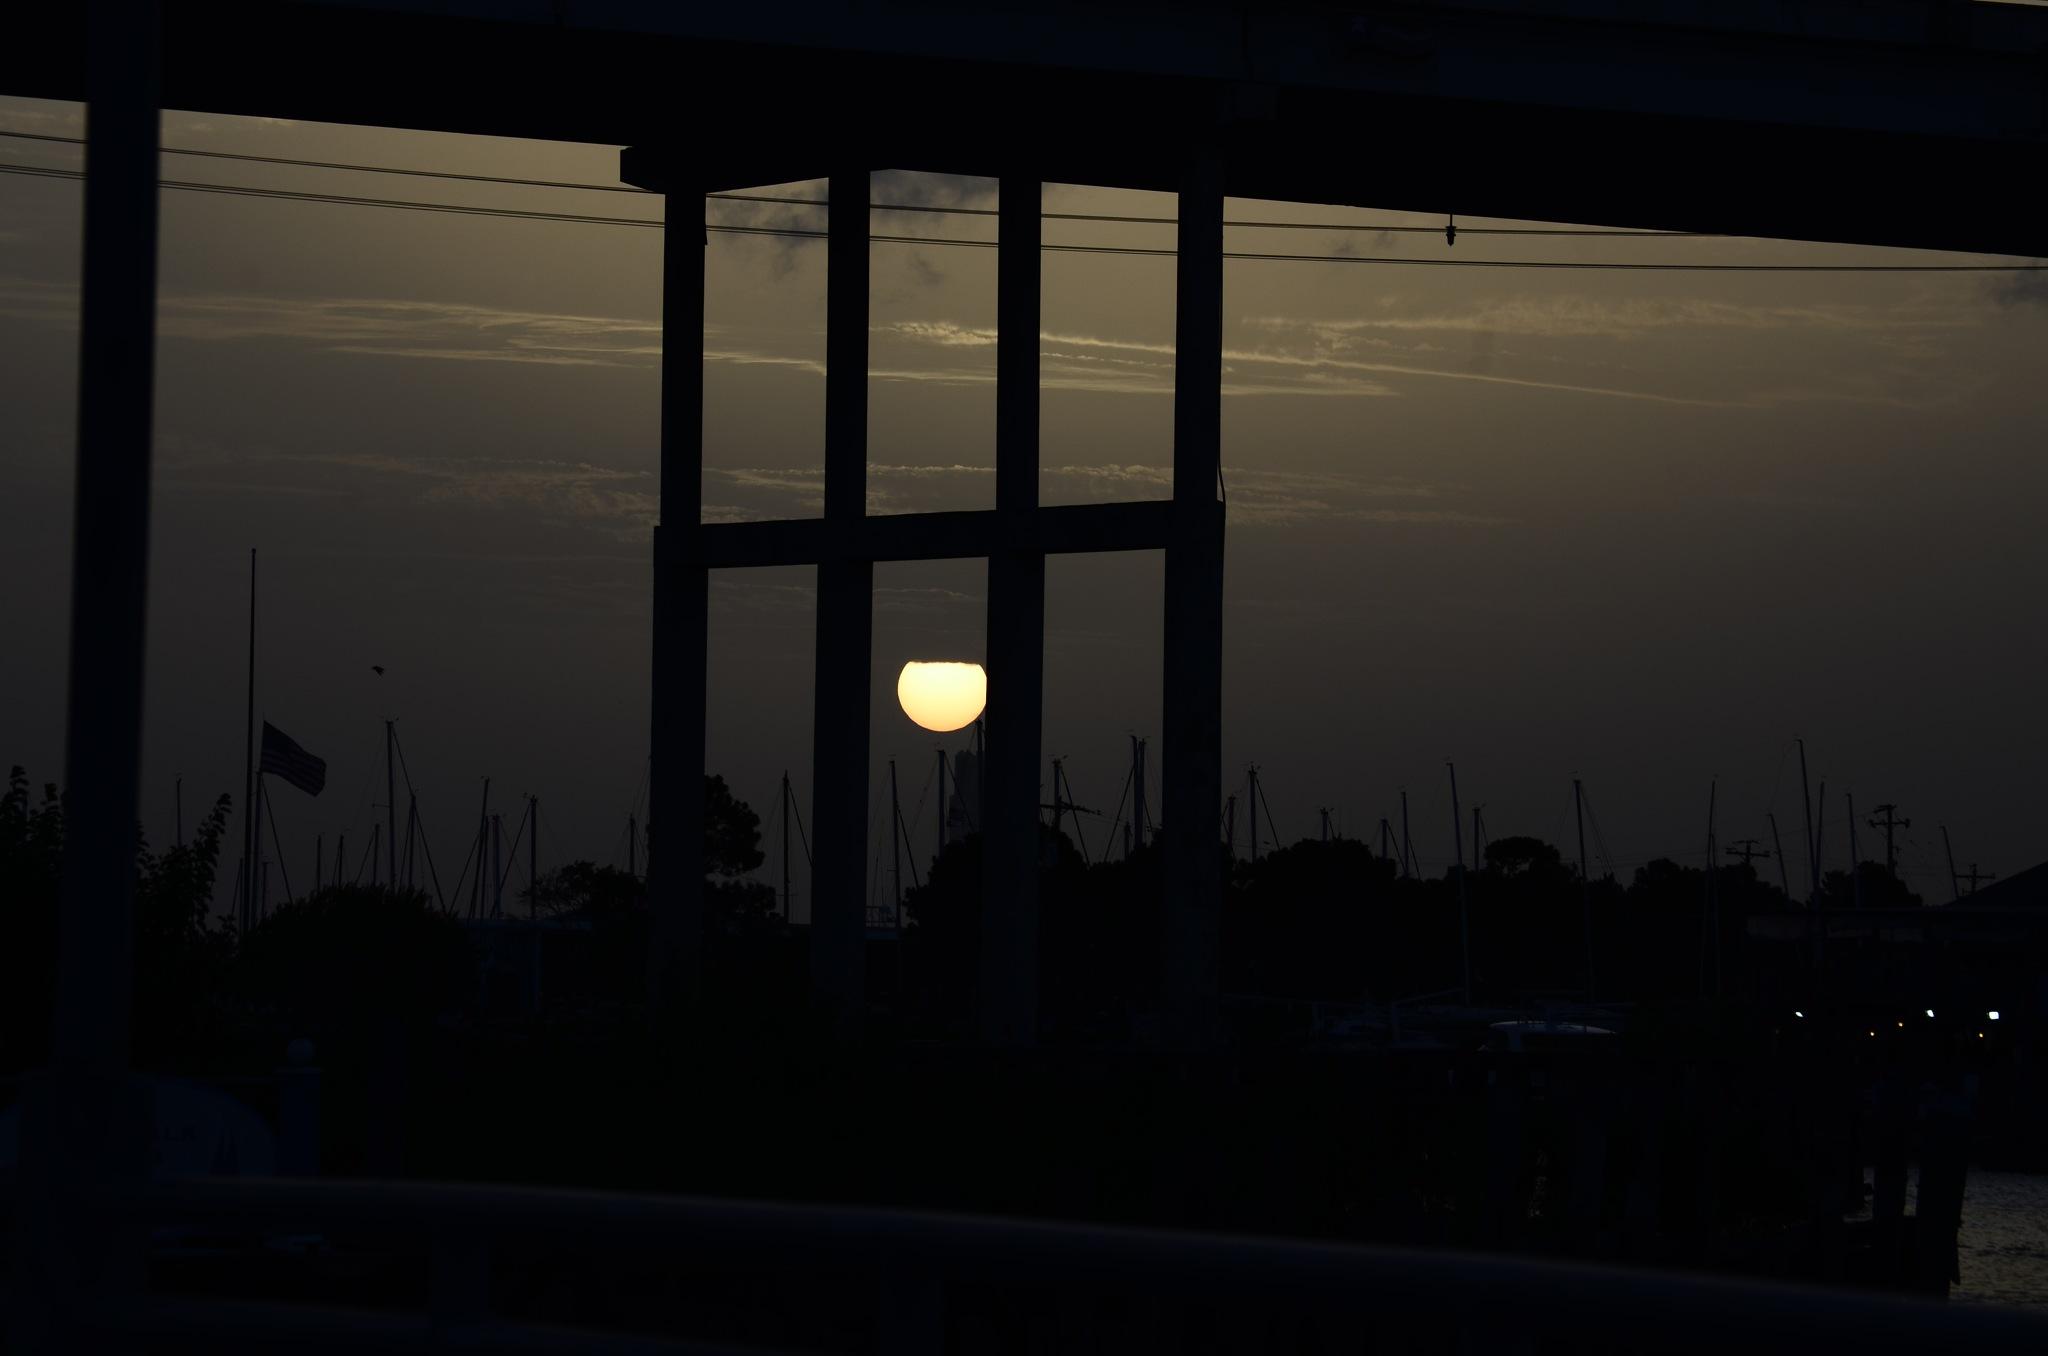 Setting sun, under the bridge by shortacd